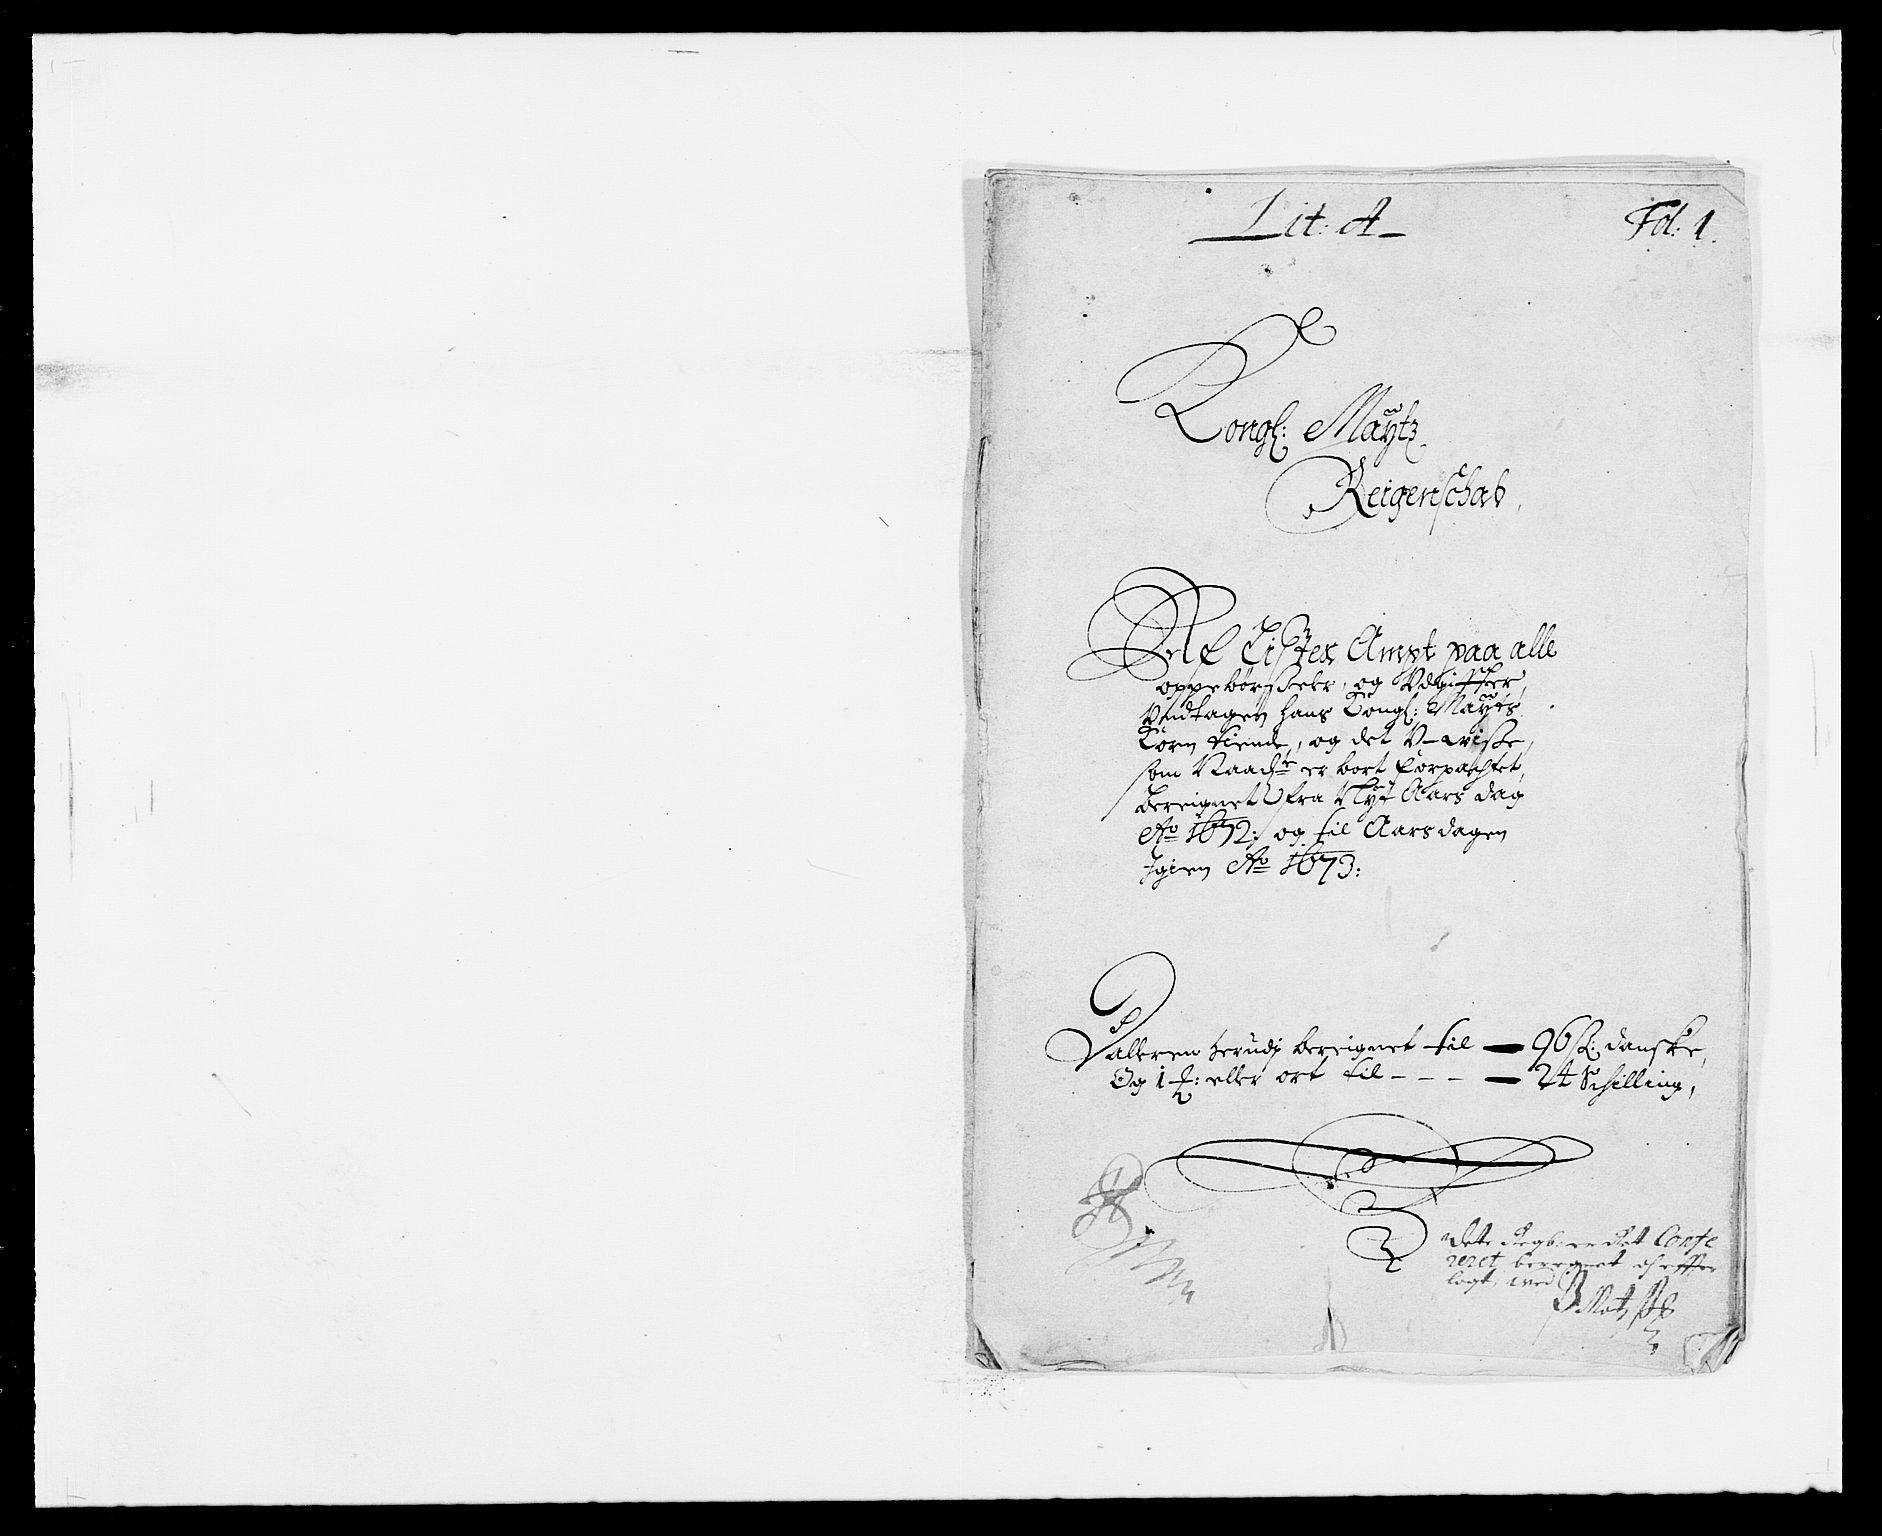 RA, Rentekammeret inntil 1814, Reviderte regnskaper, Fogderegnskap, R41/L2526: Fogderegnskap Lista, 1672, s. 1